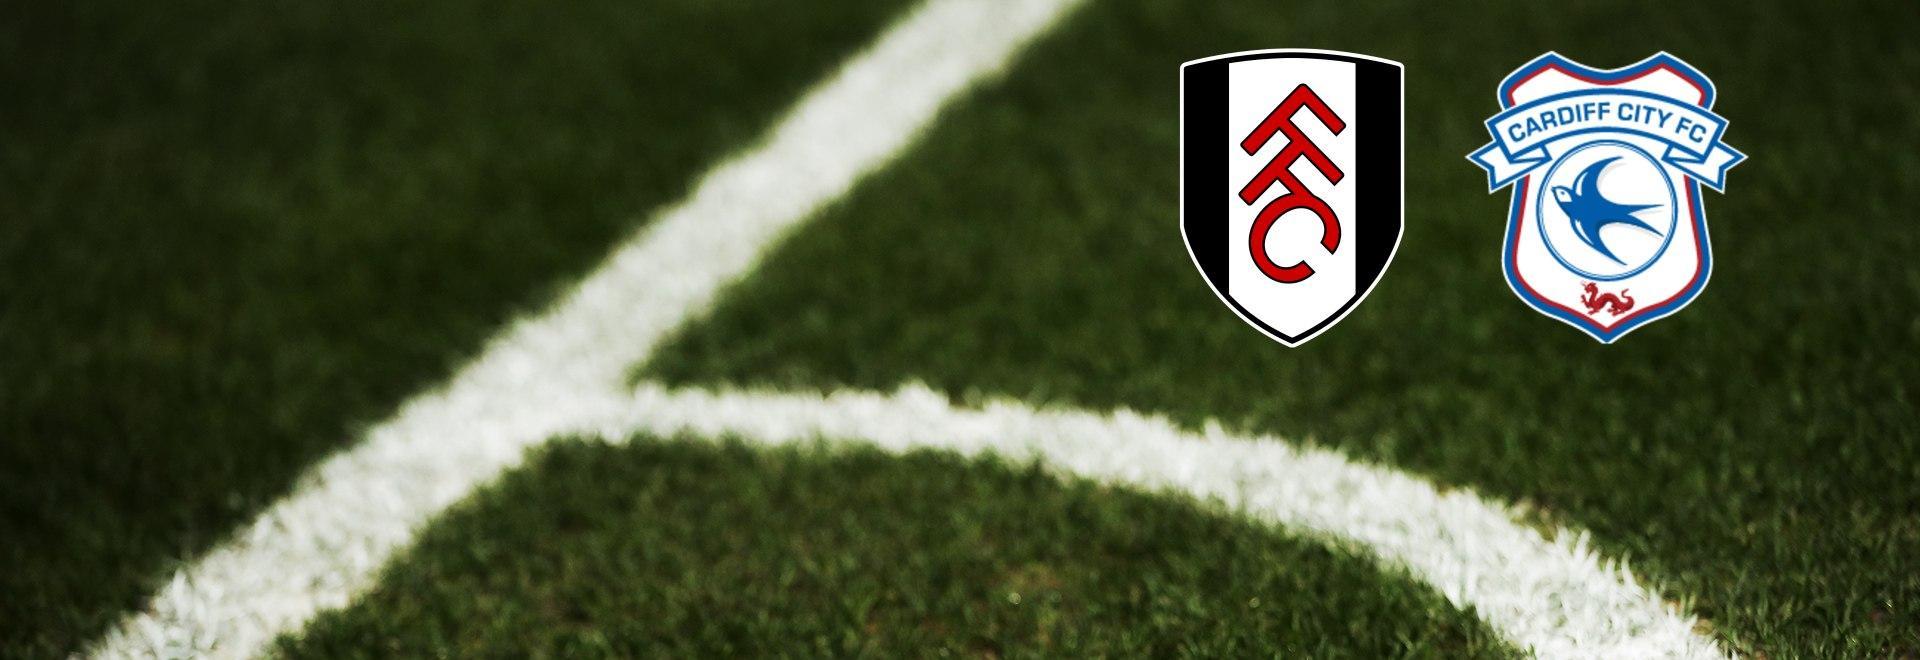 Fulham - Cardiff City